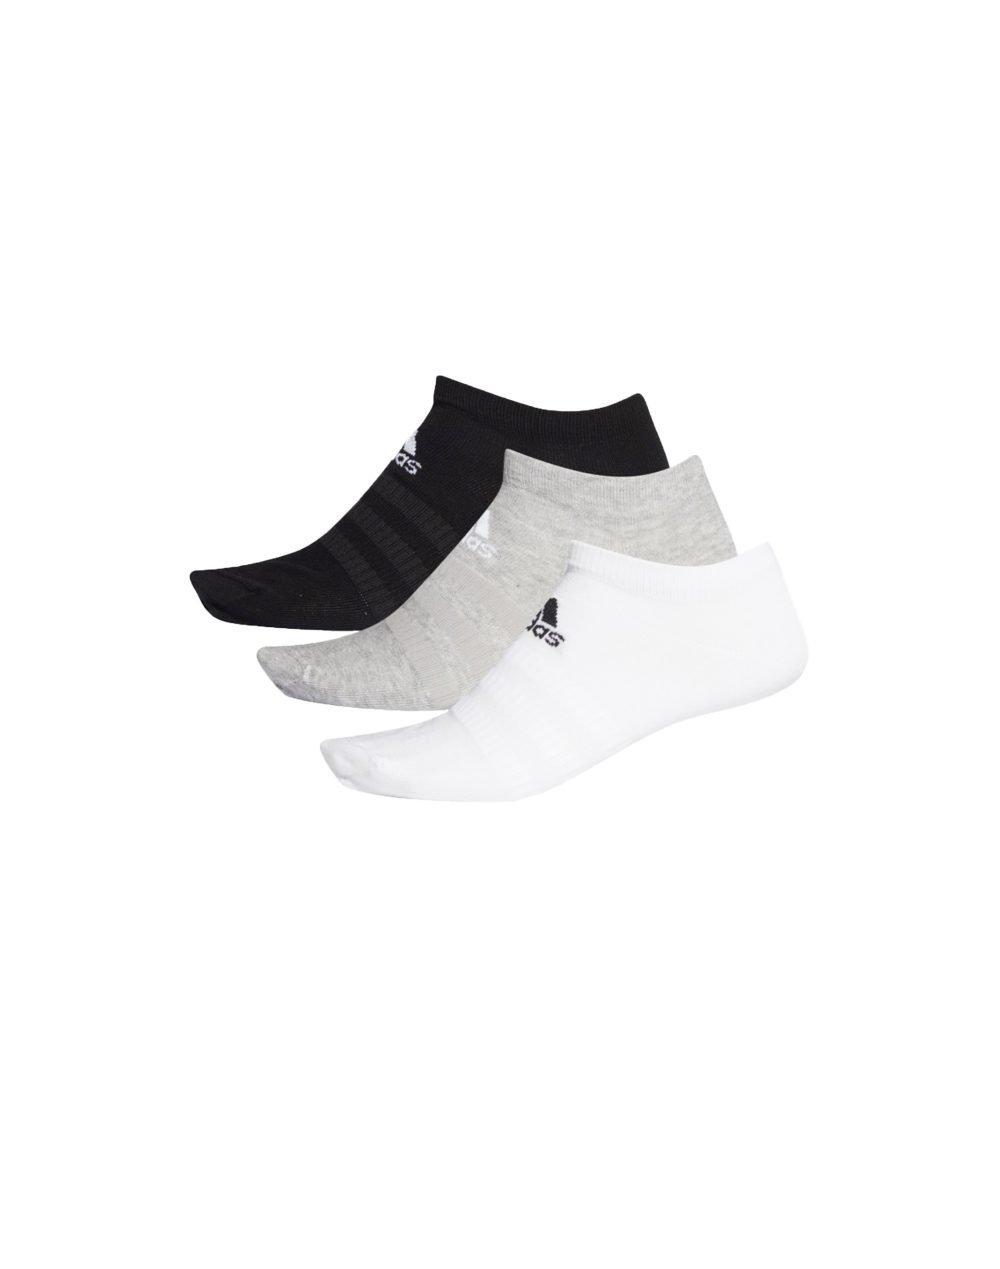 Adidas Light Low 3PP Socks (DZ9400) Black/White/Grey